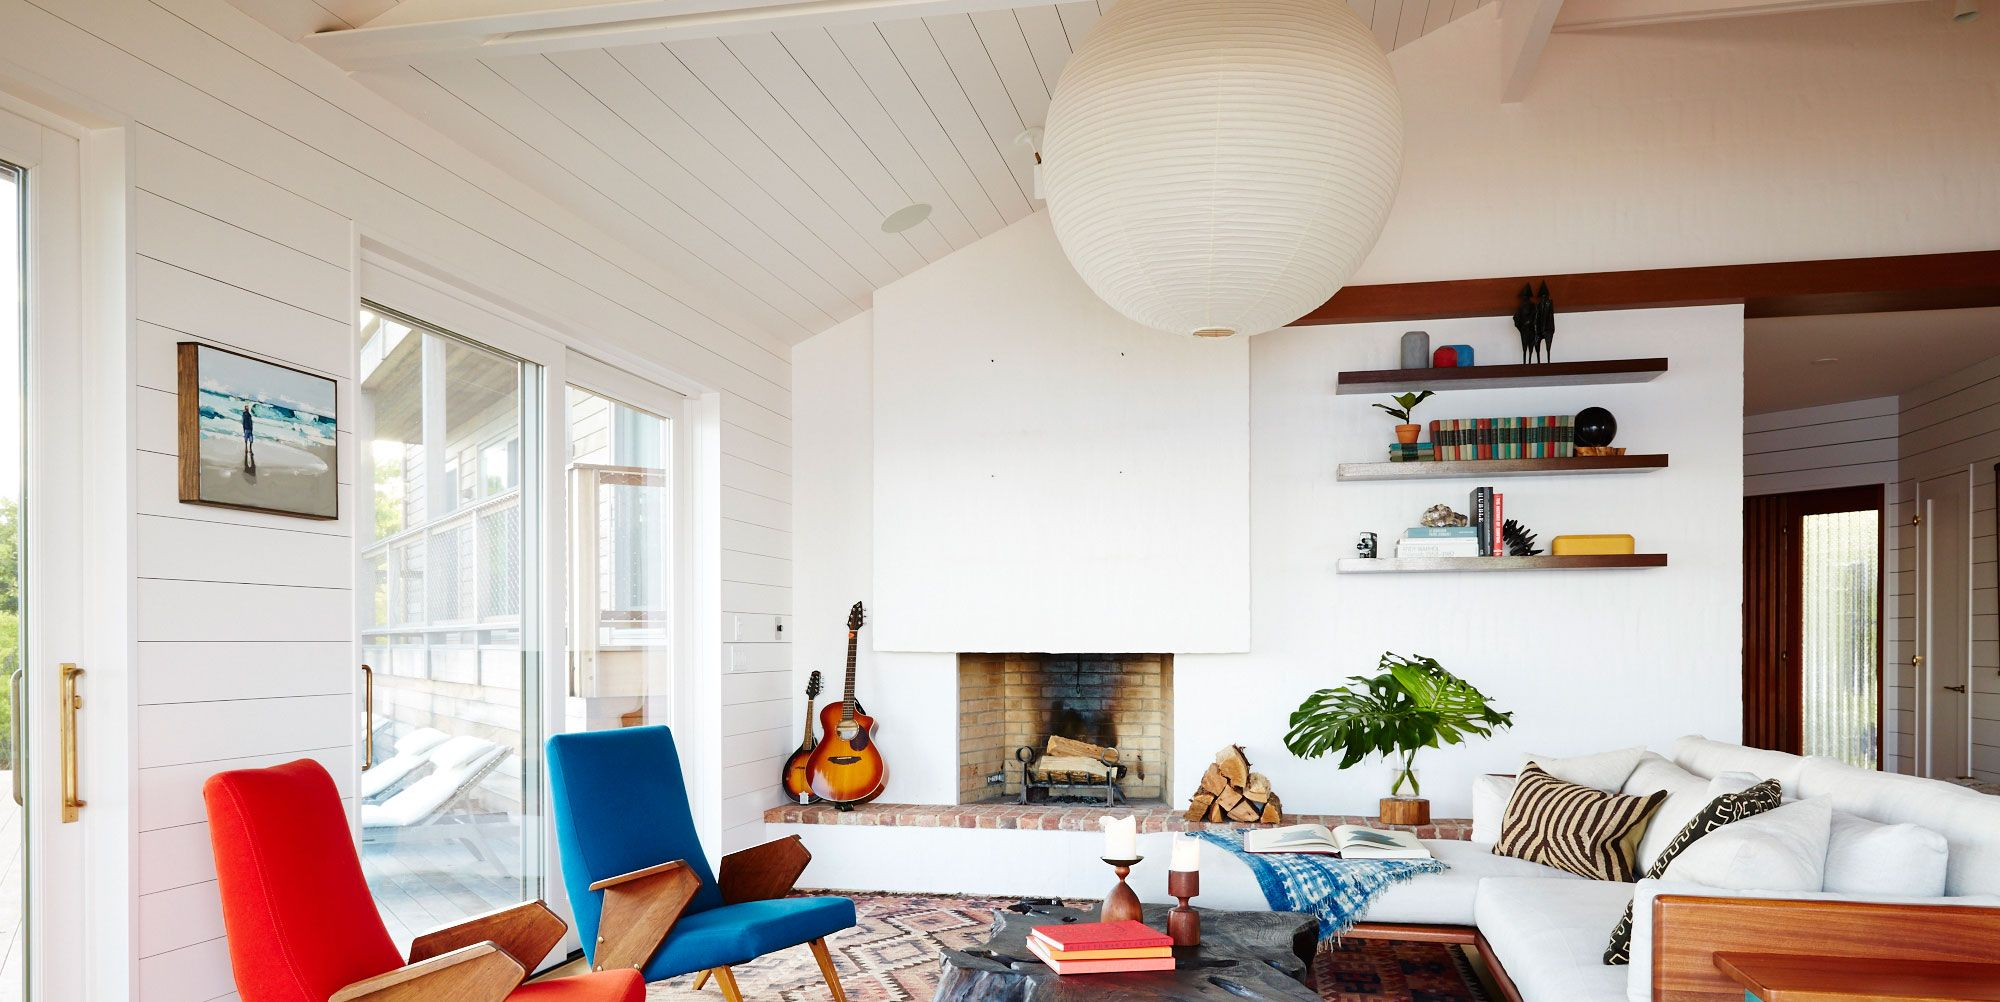 30 Stylish Family Room Design Ideas